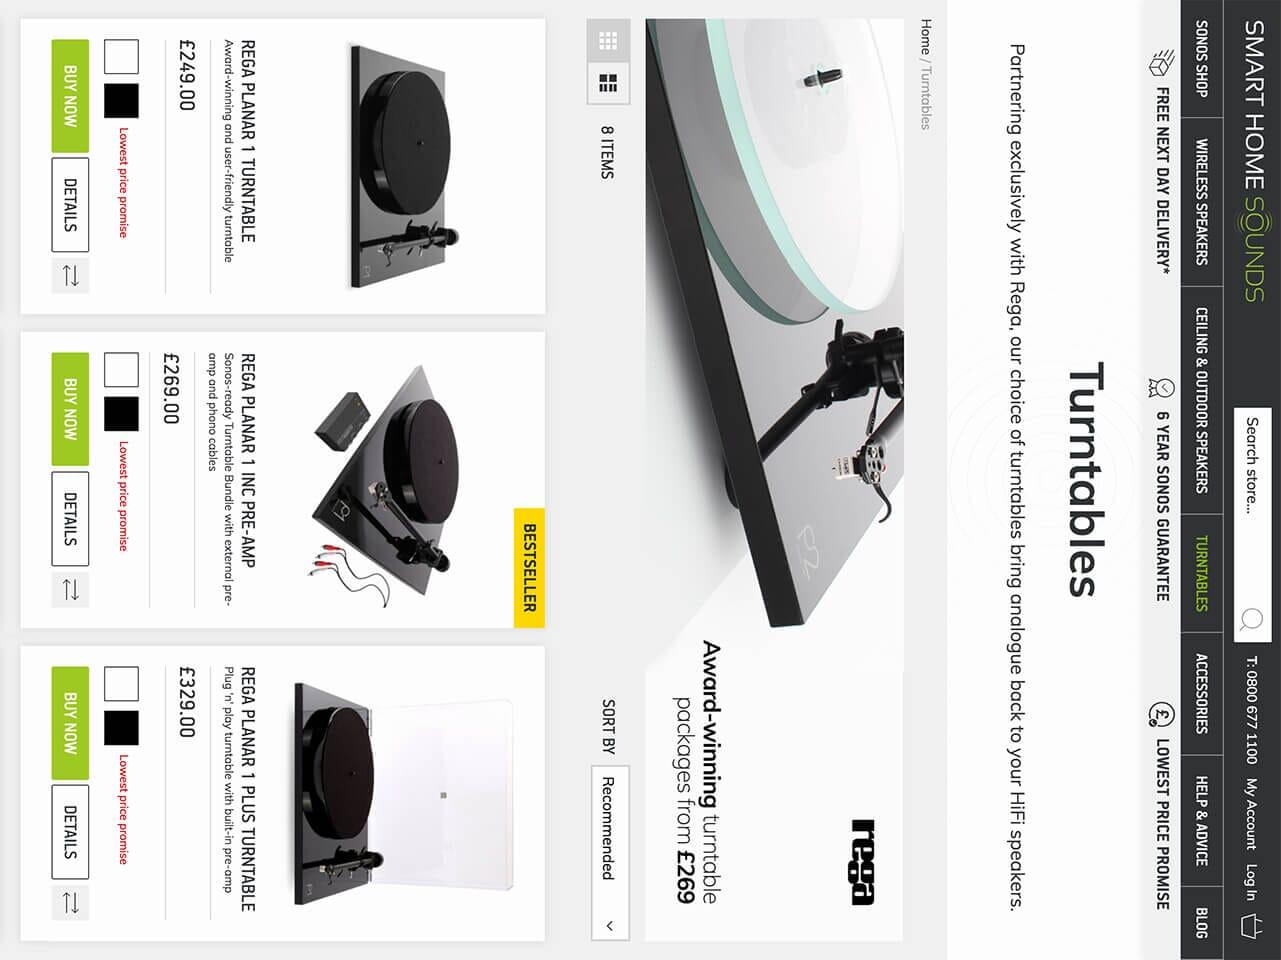 smart-home-sounds-tablet